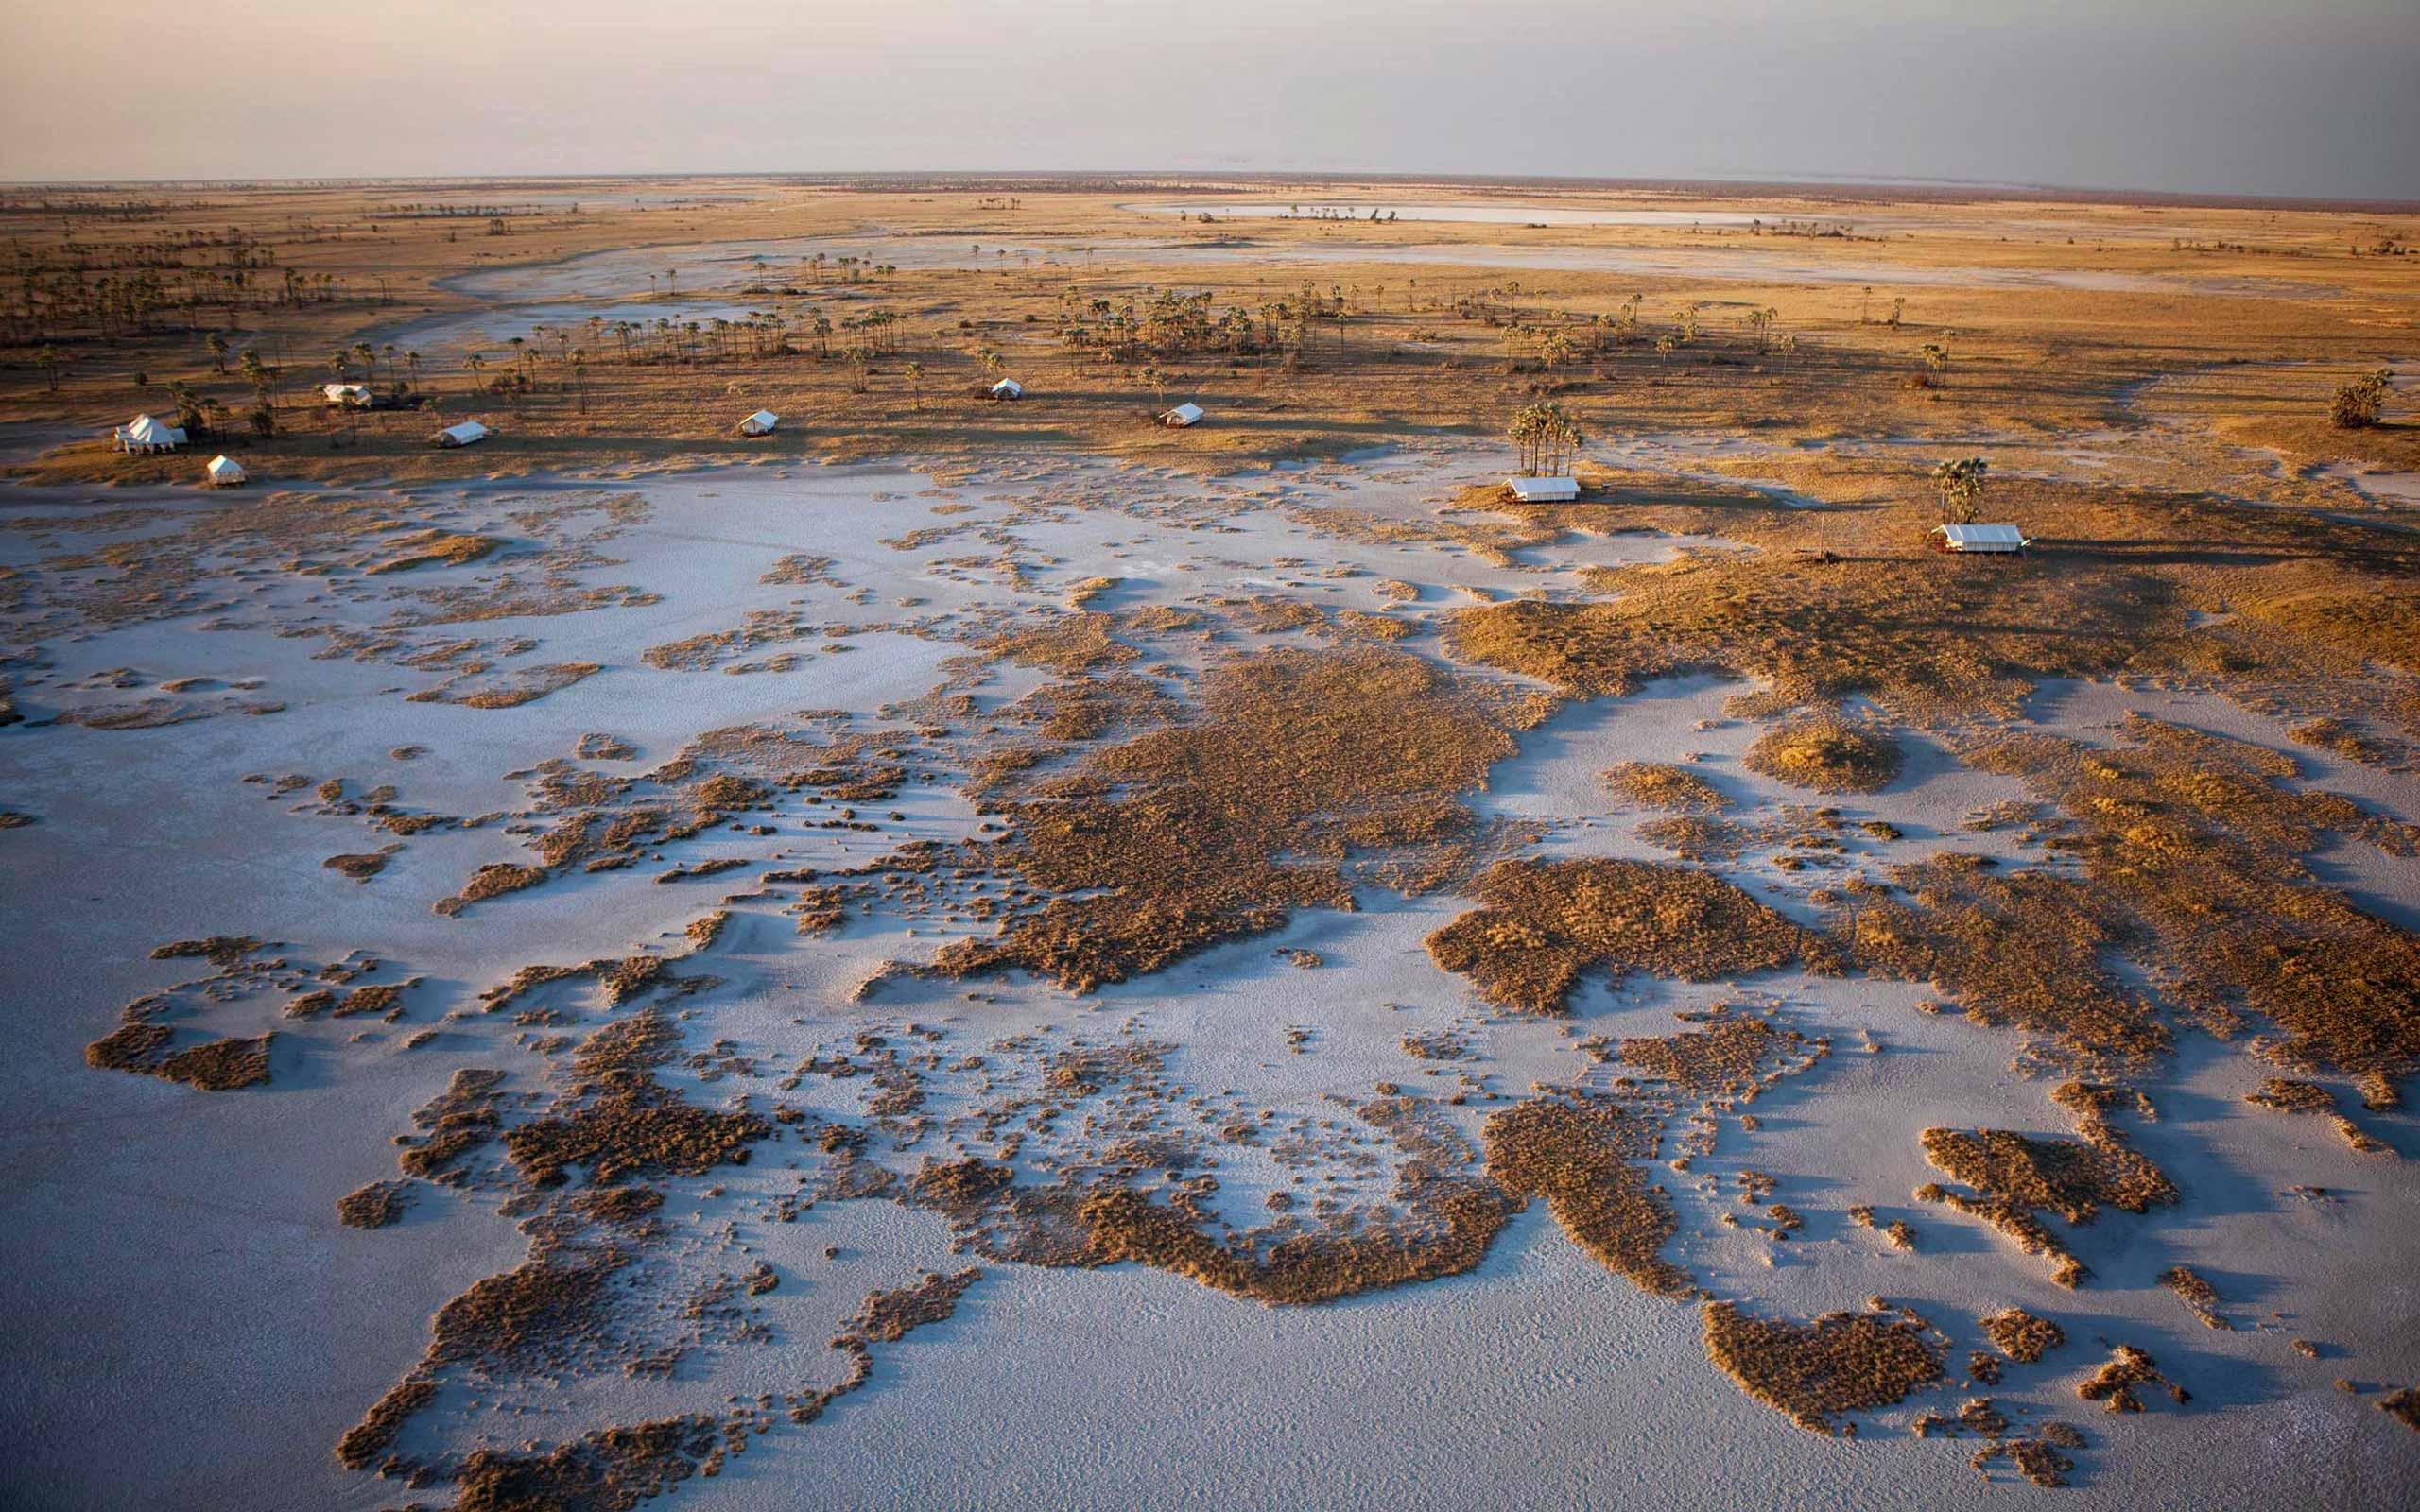 enkosi-africa-safari-botswana-makgadikgadi-pans-uncharted-san-camp-birdseye